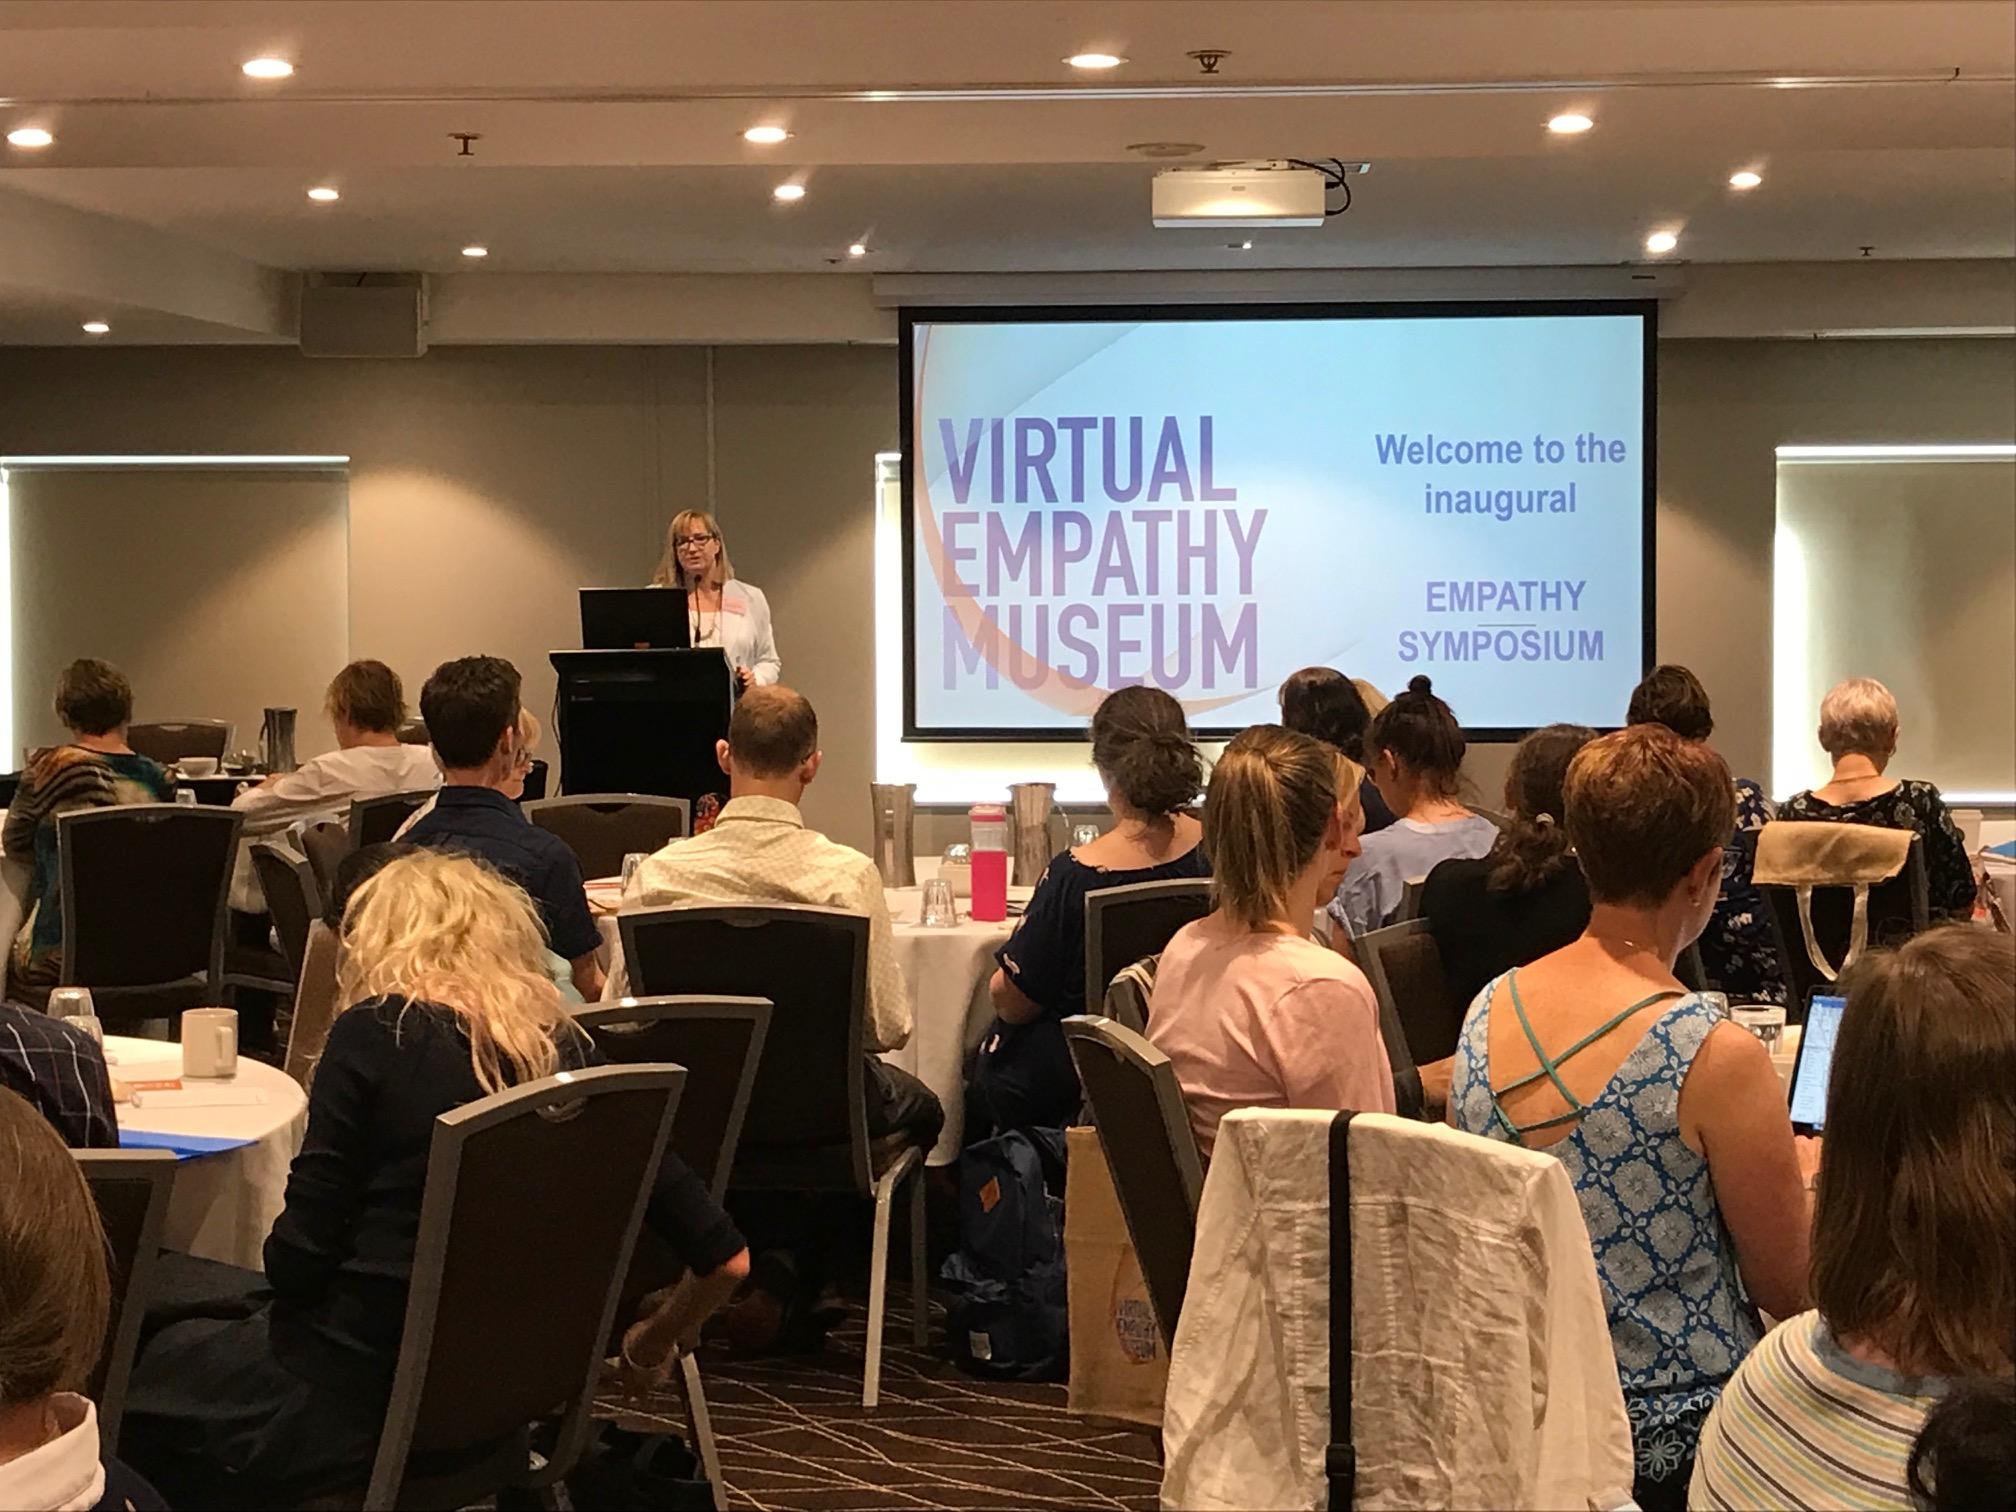 Tracy Levett-Jones providing opening address at the Empathy Symposium